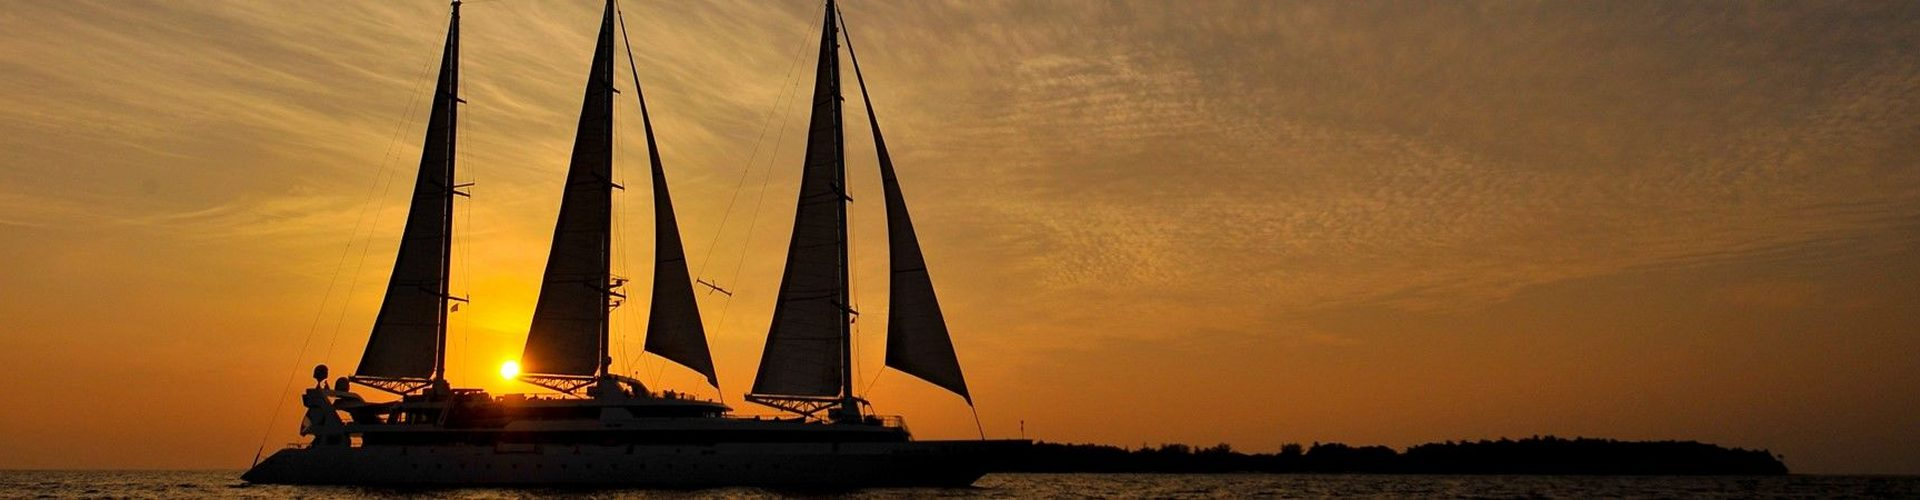 Mittelmeer Kreuzfahrten mit Le Ponant